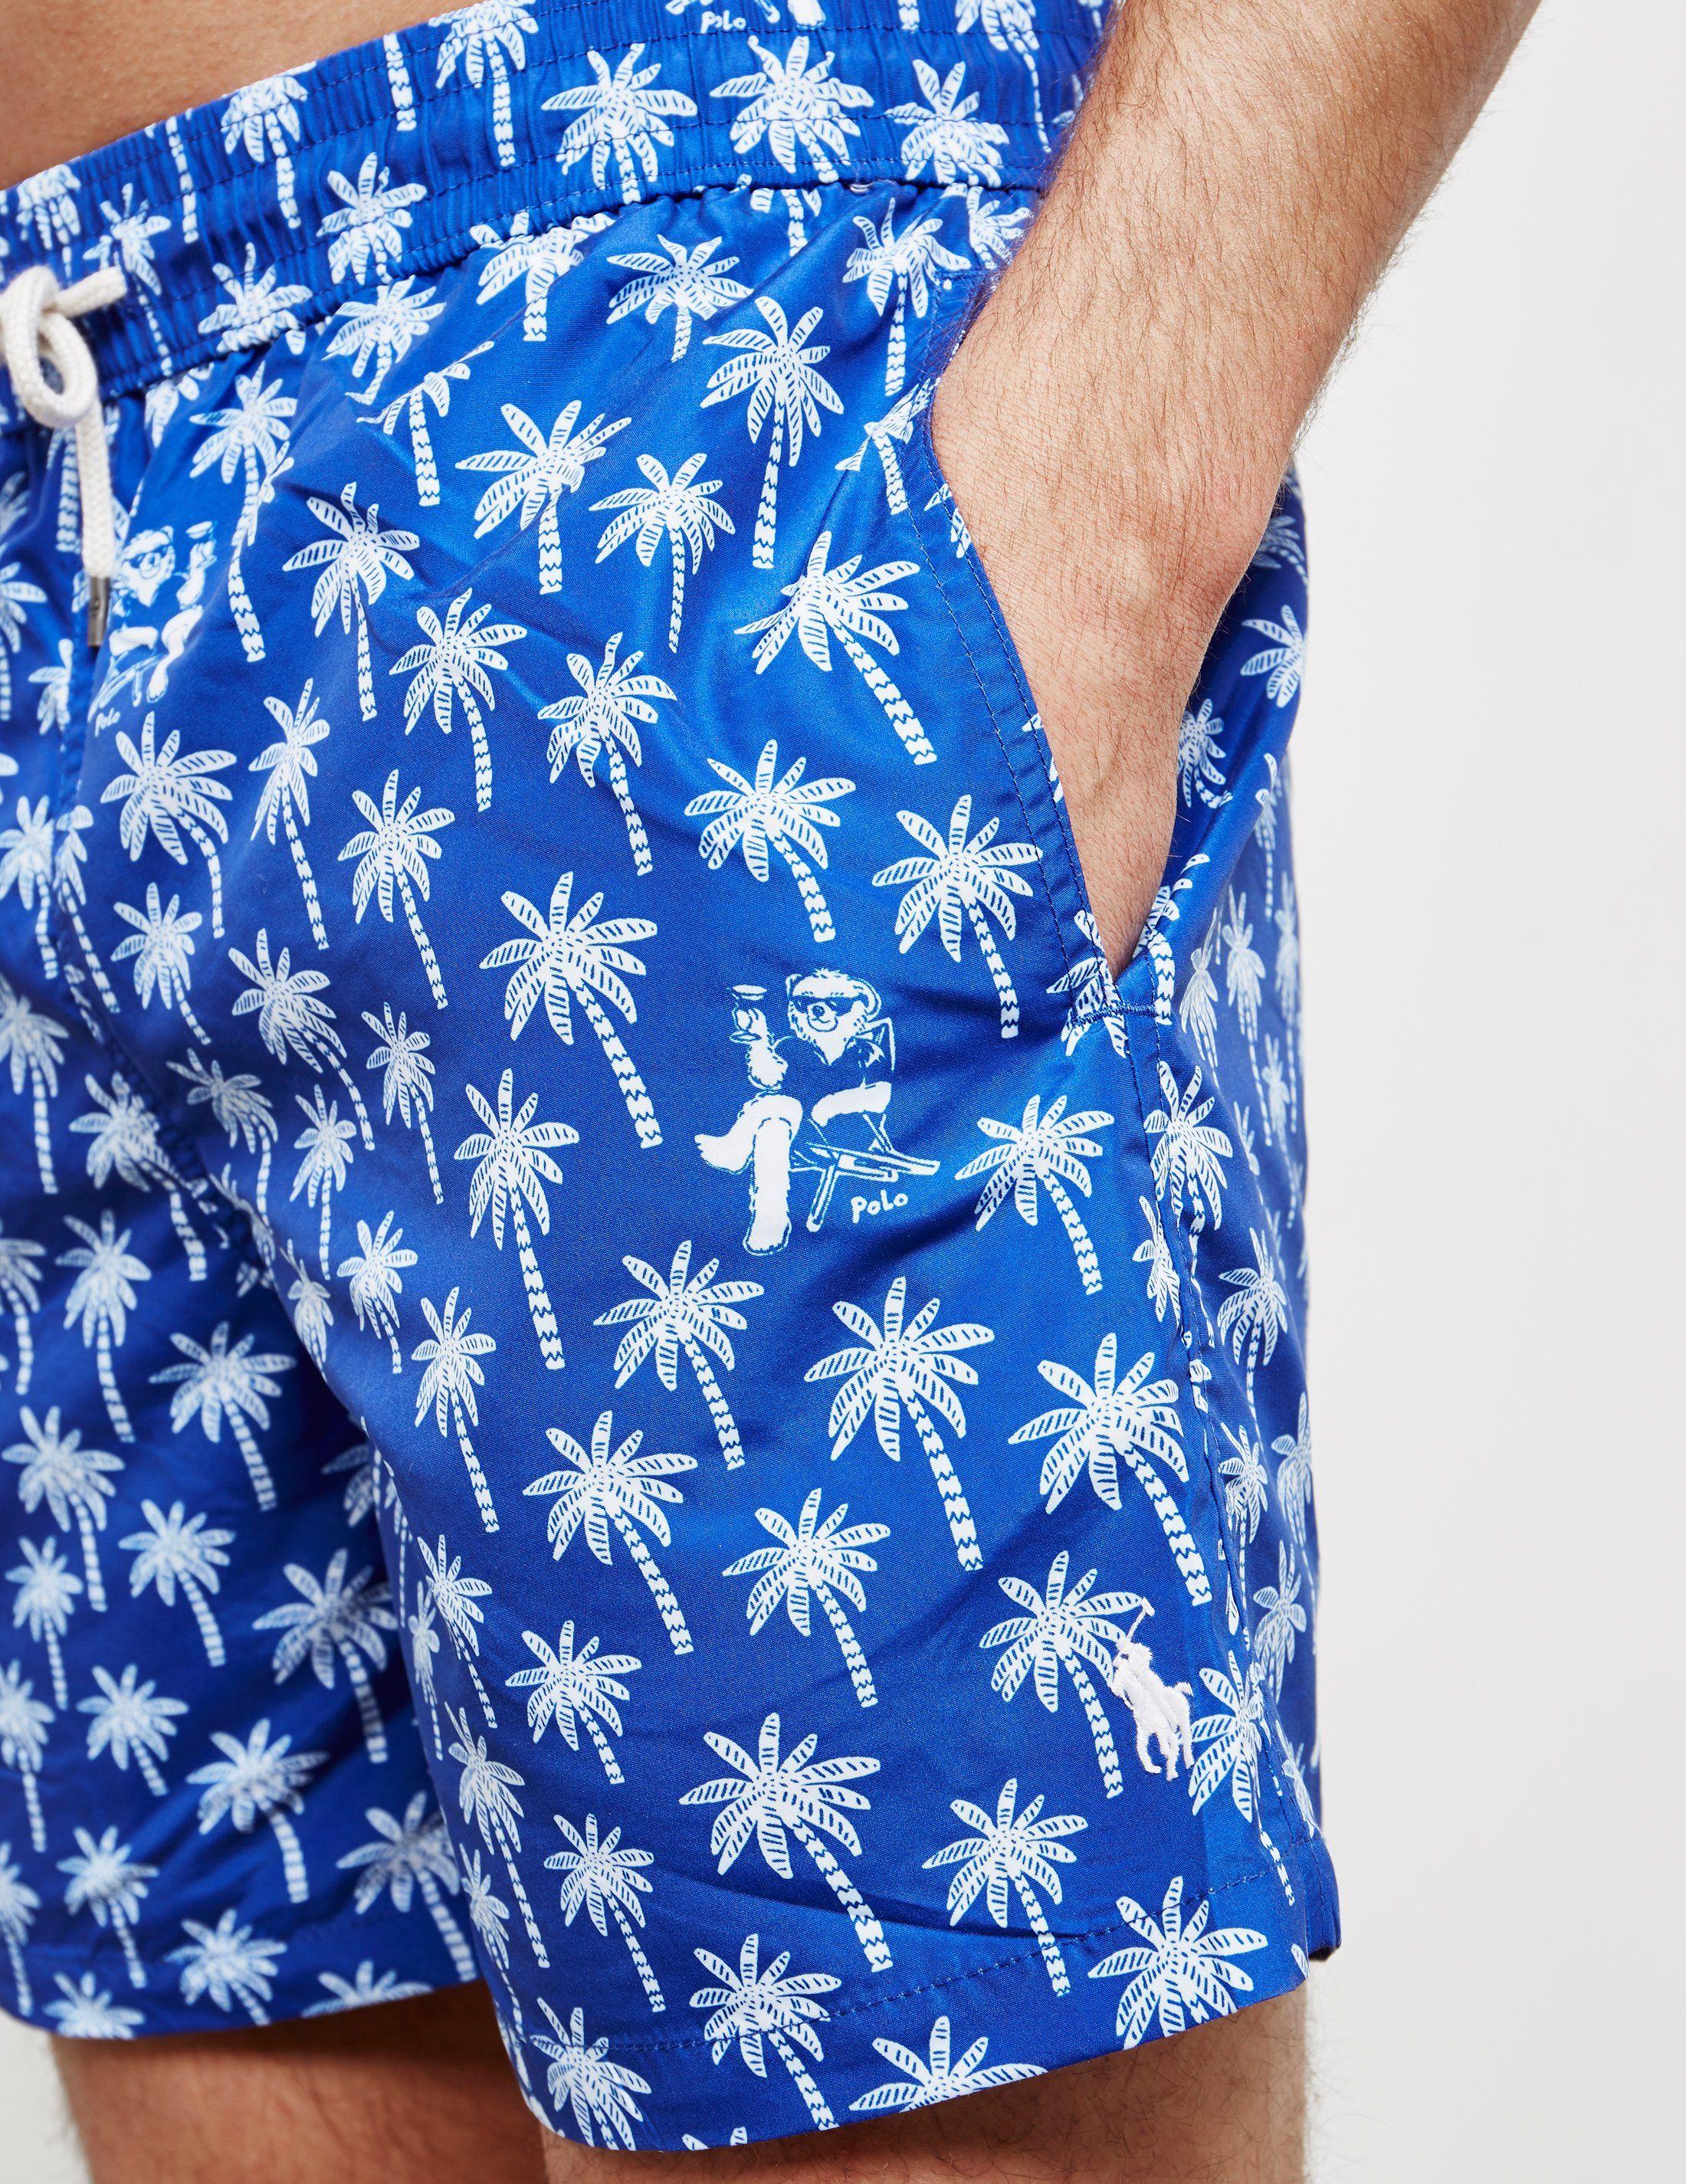 Polo Ralph Lauren Palm Swim Shorts